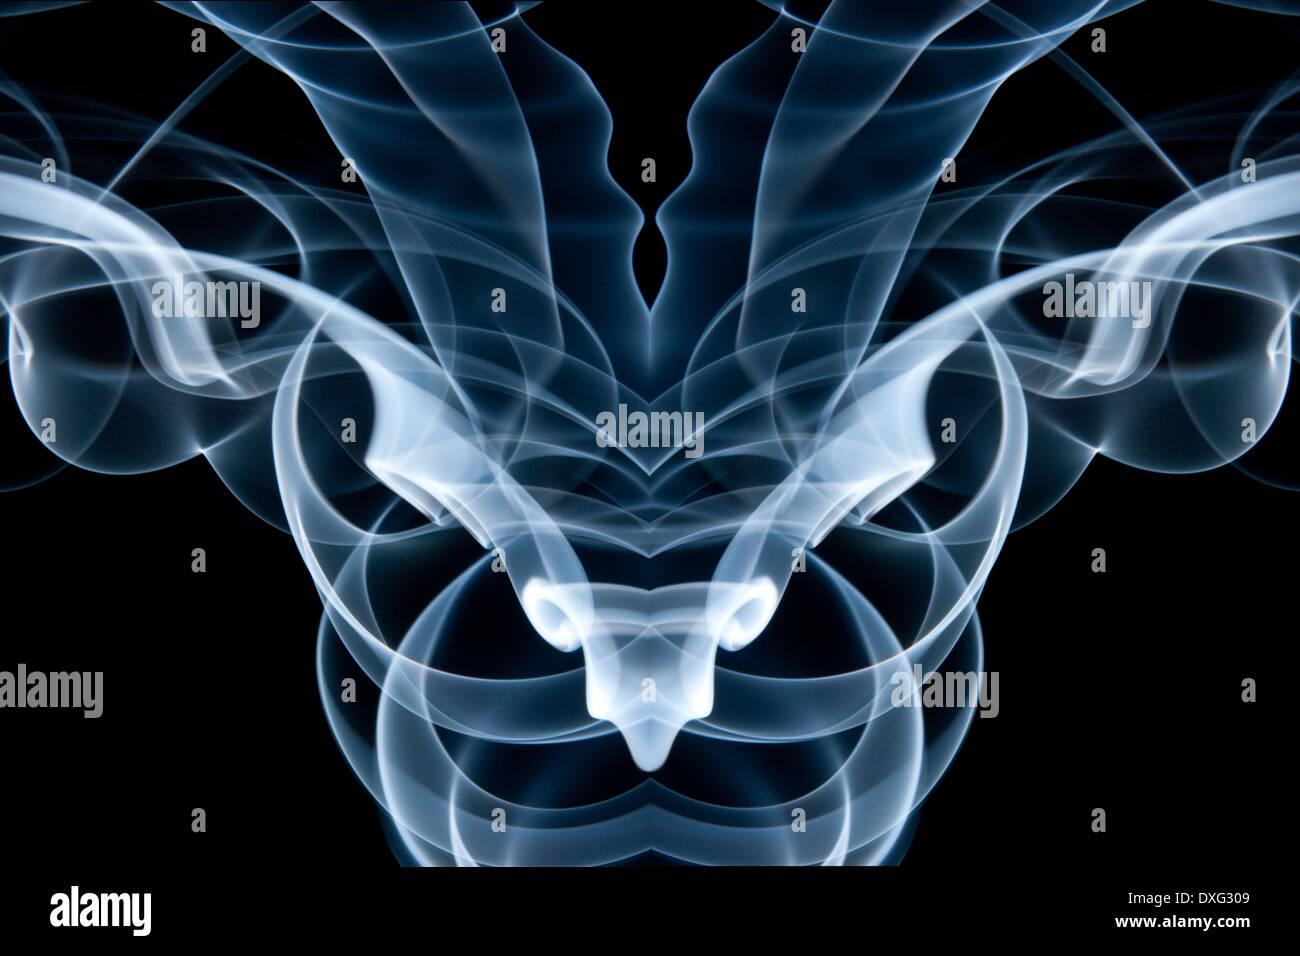 Smoke swirls made into an abstract design. - Stock Image